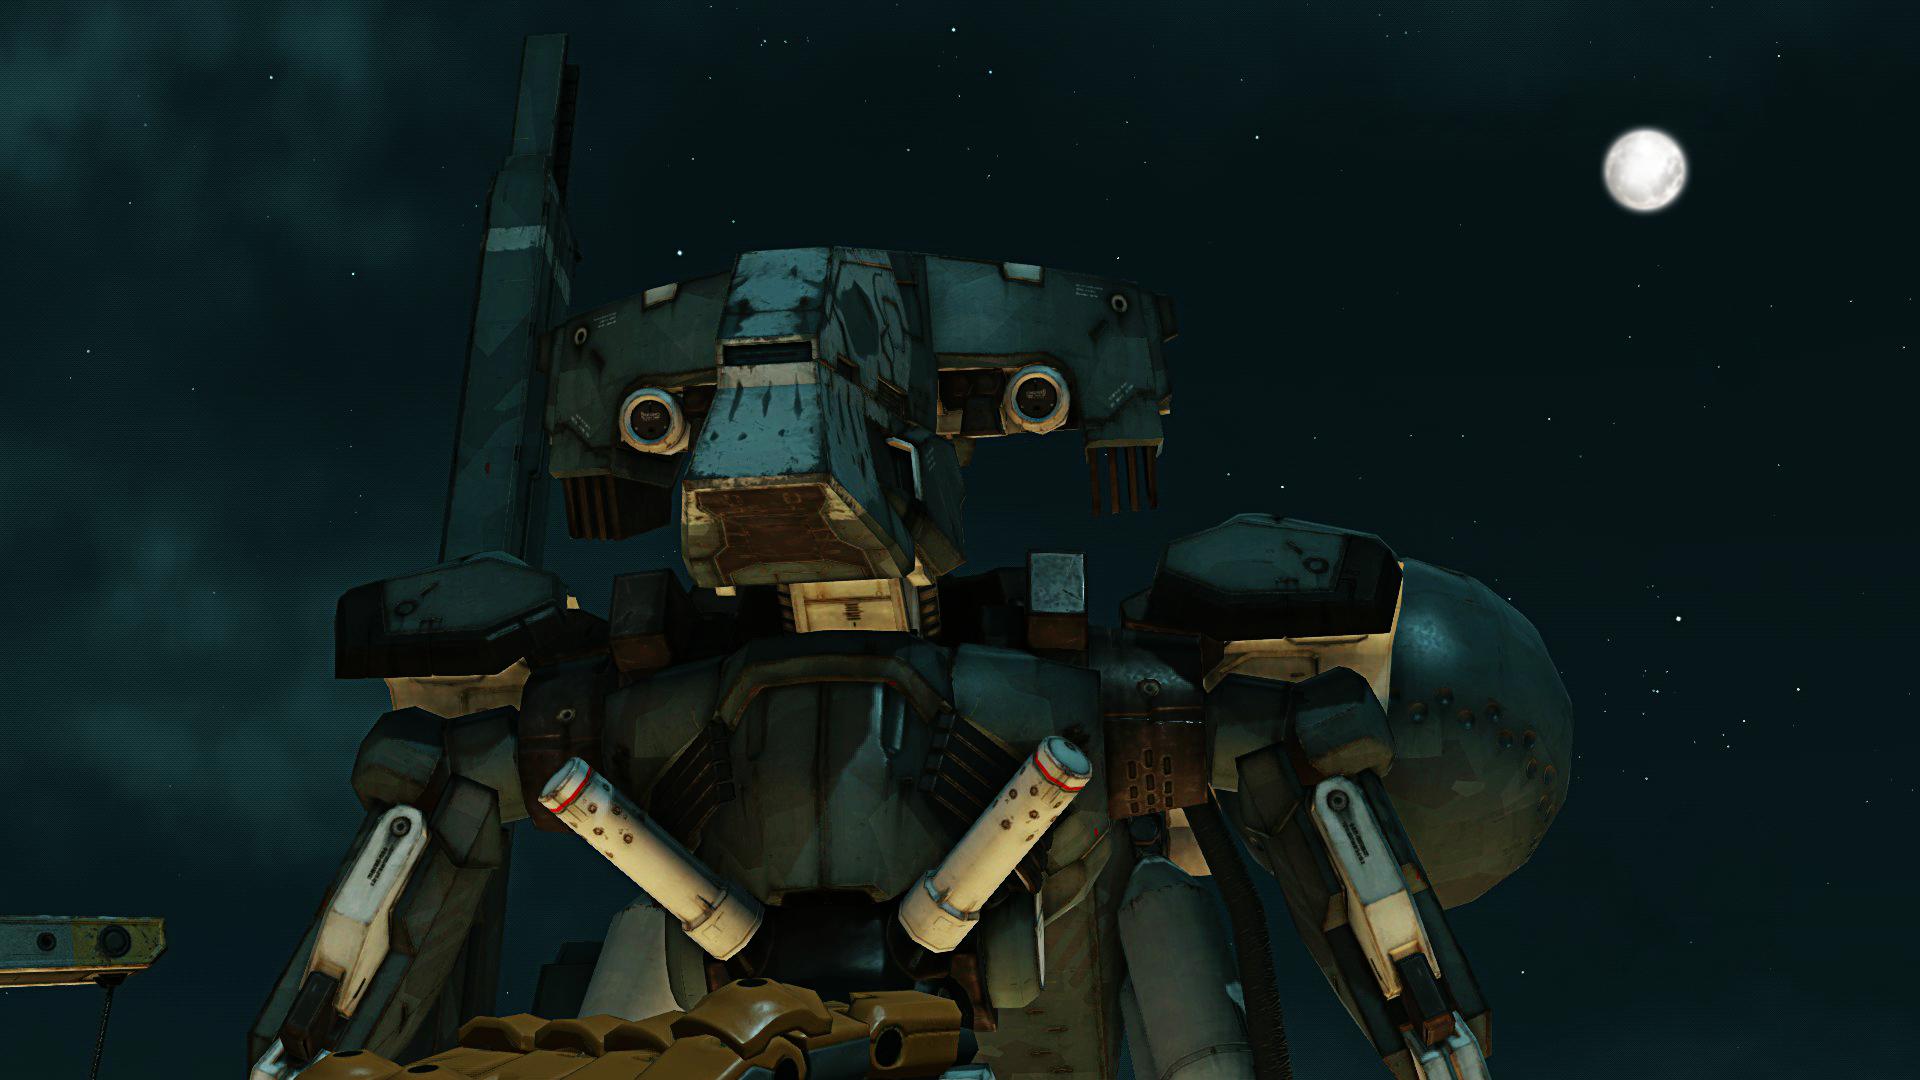 Metal Gear Sahelanthropus - MGSV TPP by BillyM12345 on DeviantArt